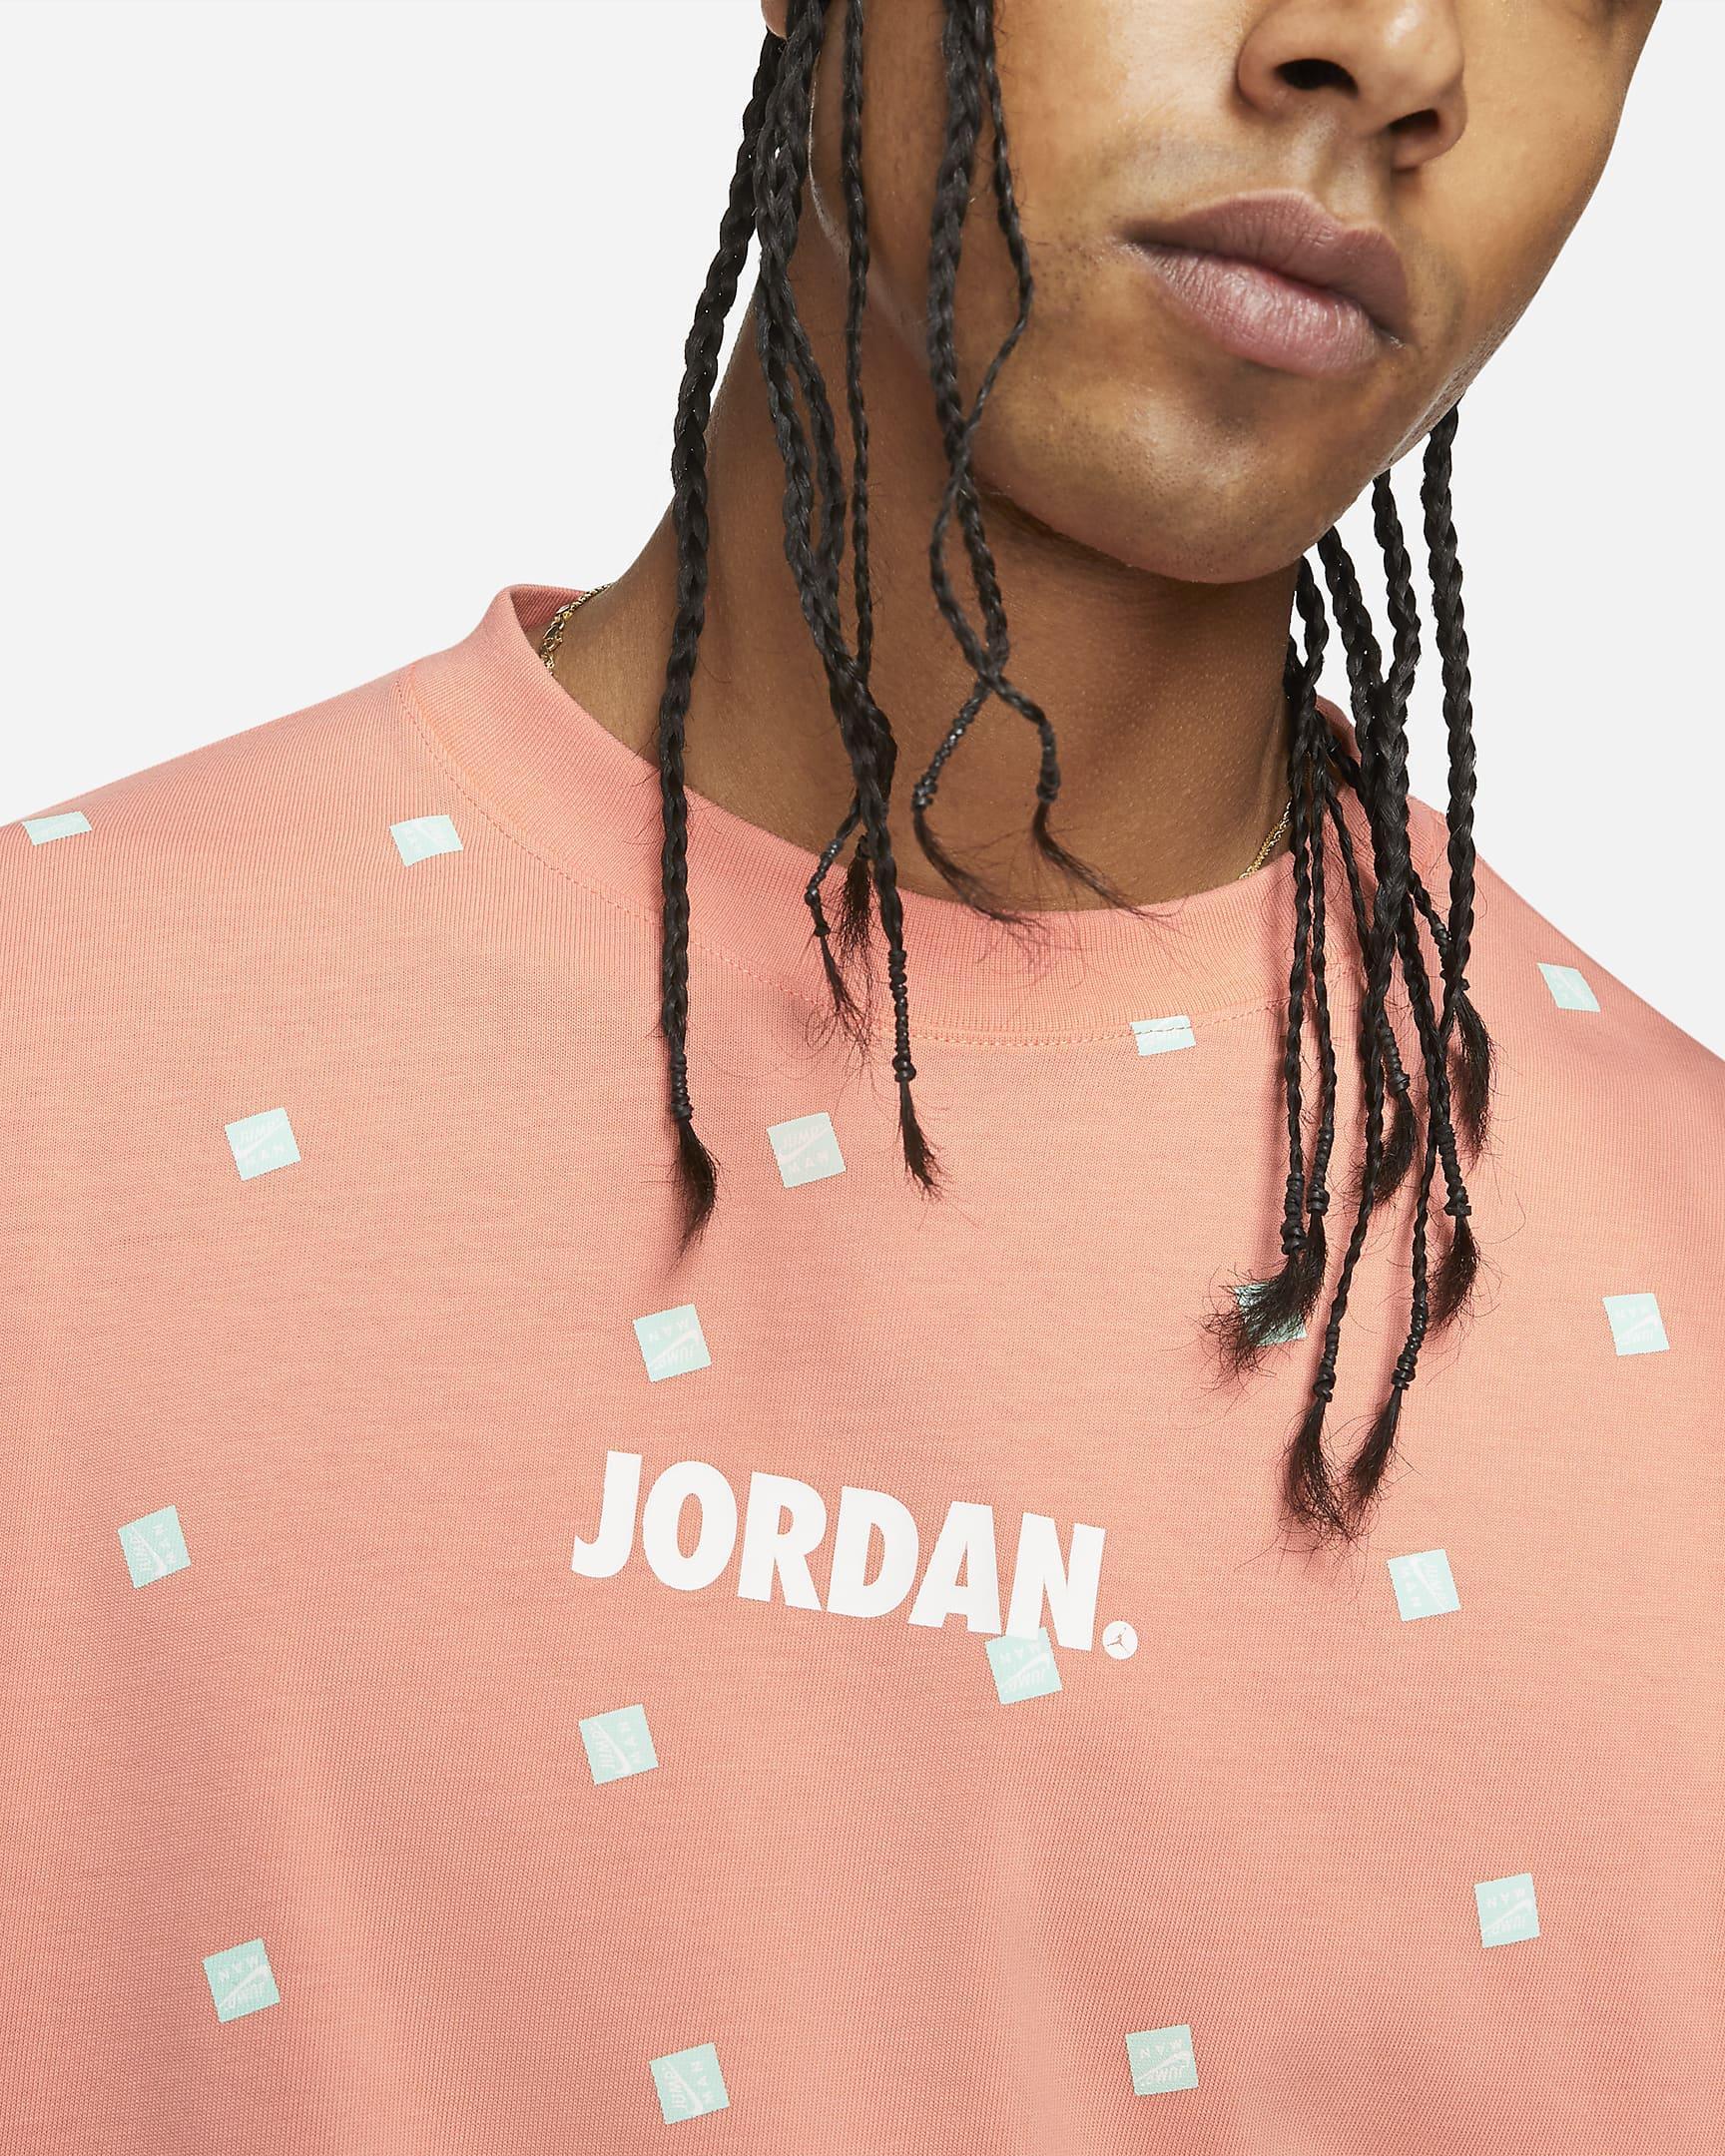 nike air jordan 11 malaysia online shop store